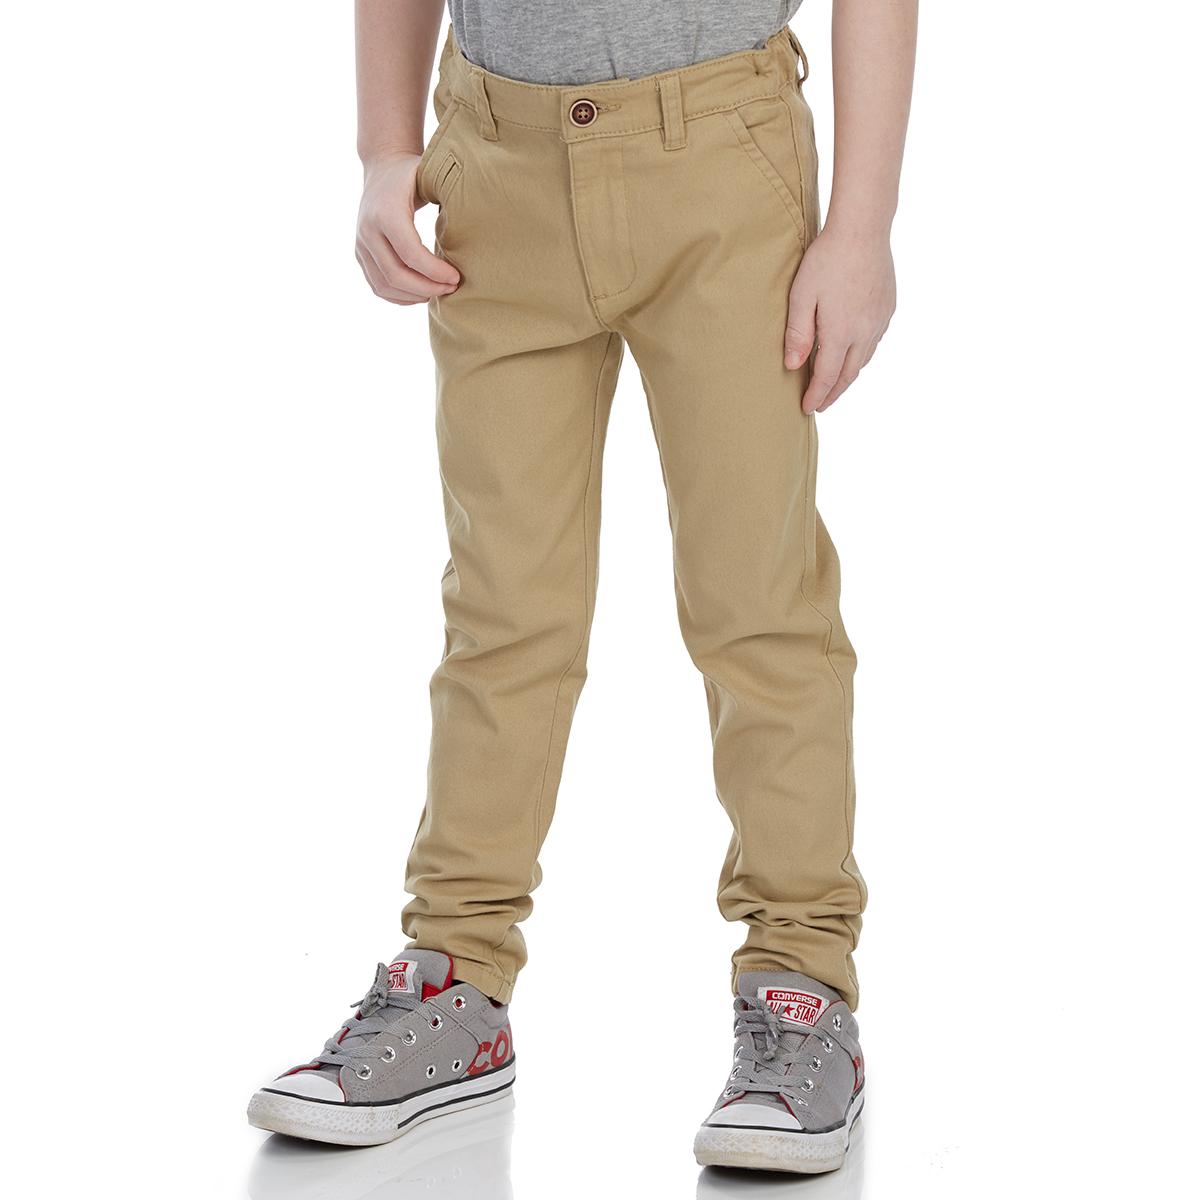 Minoti Big Boys' Chino Pants - Brown, 4-5